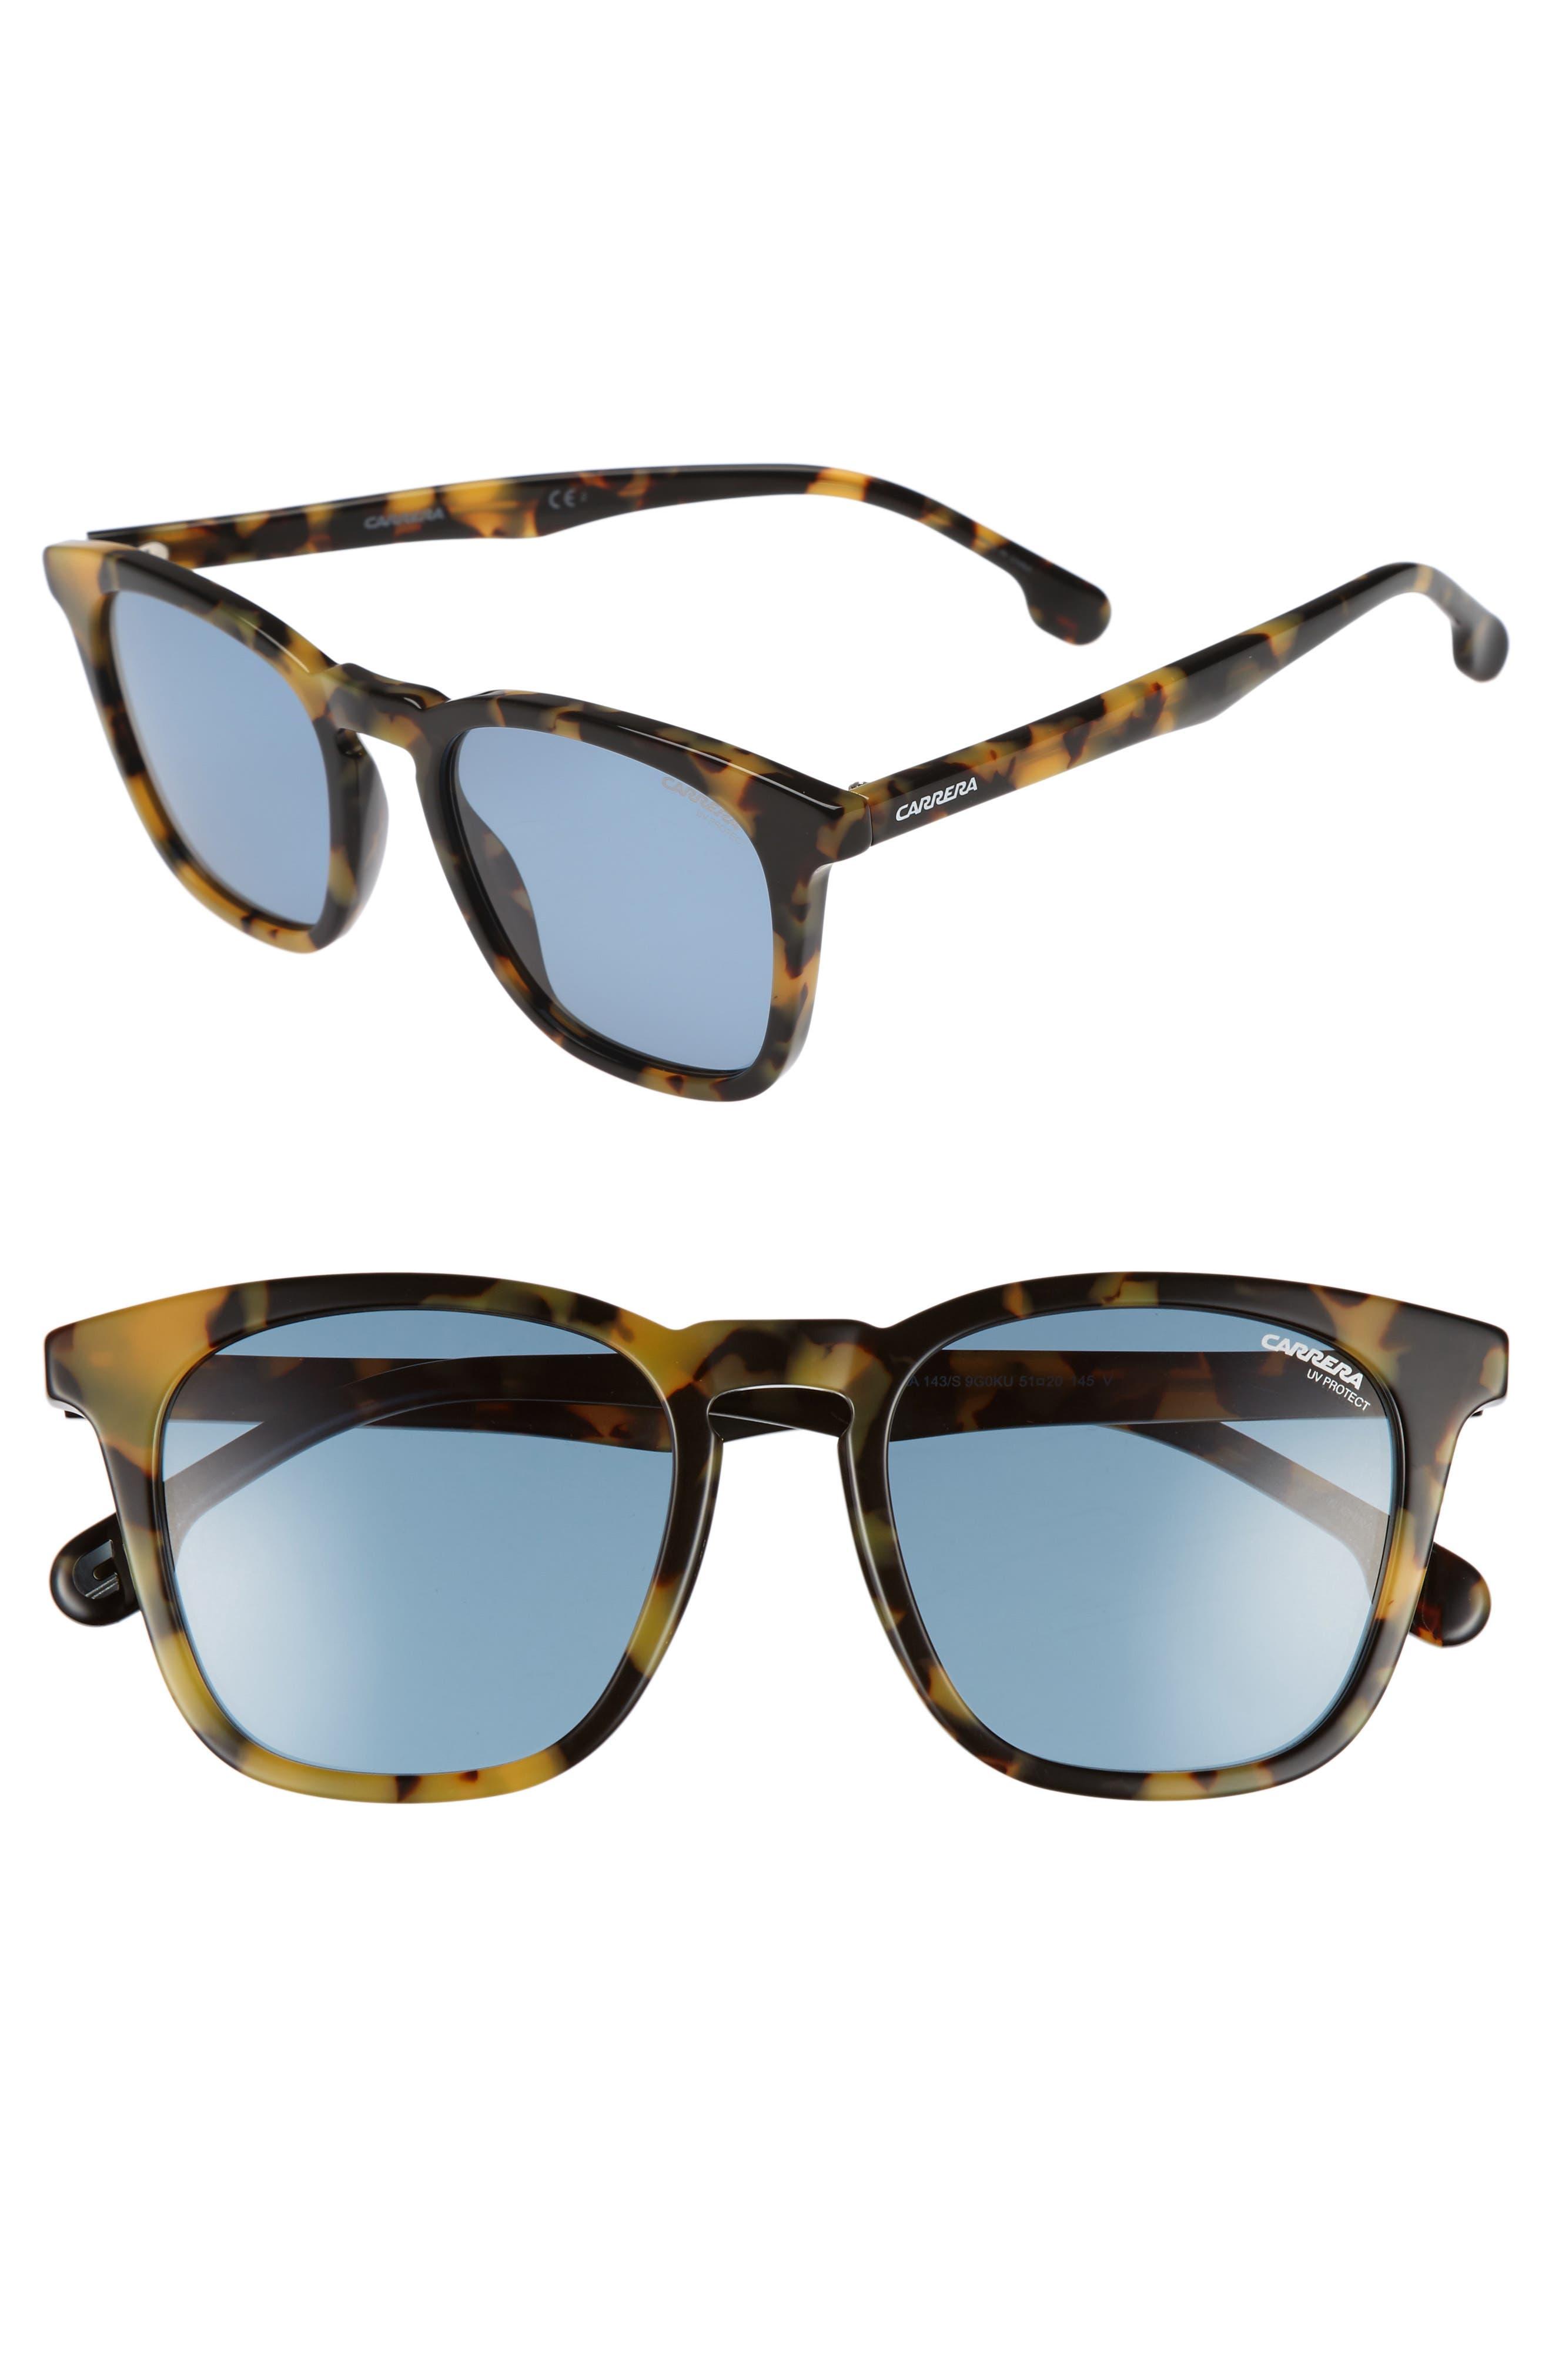 Carrera 143S 51mm Sunglasses,                         Main,                         color, Havana Palladium/ Blue Avio